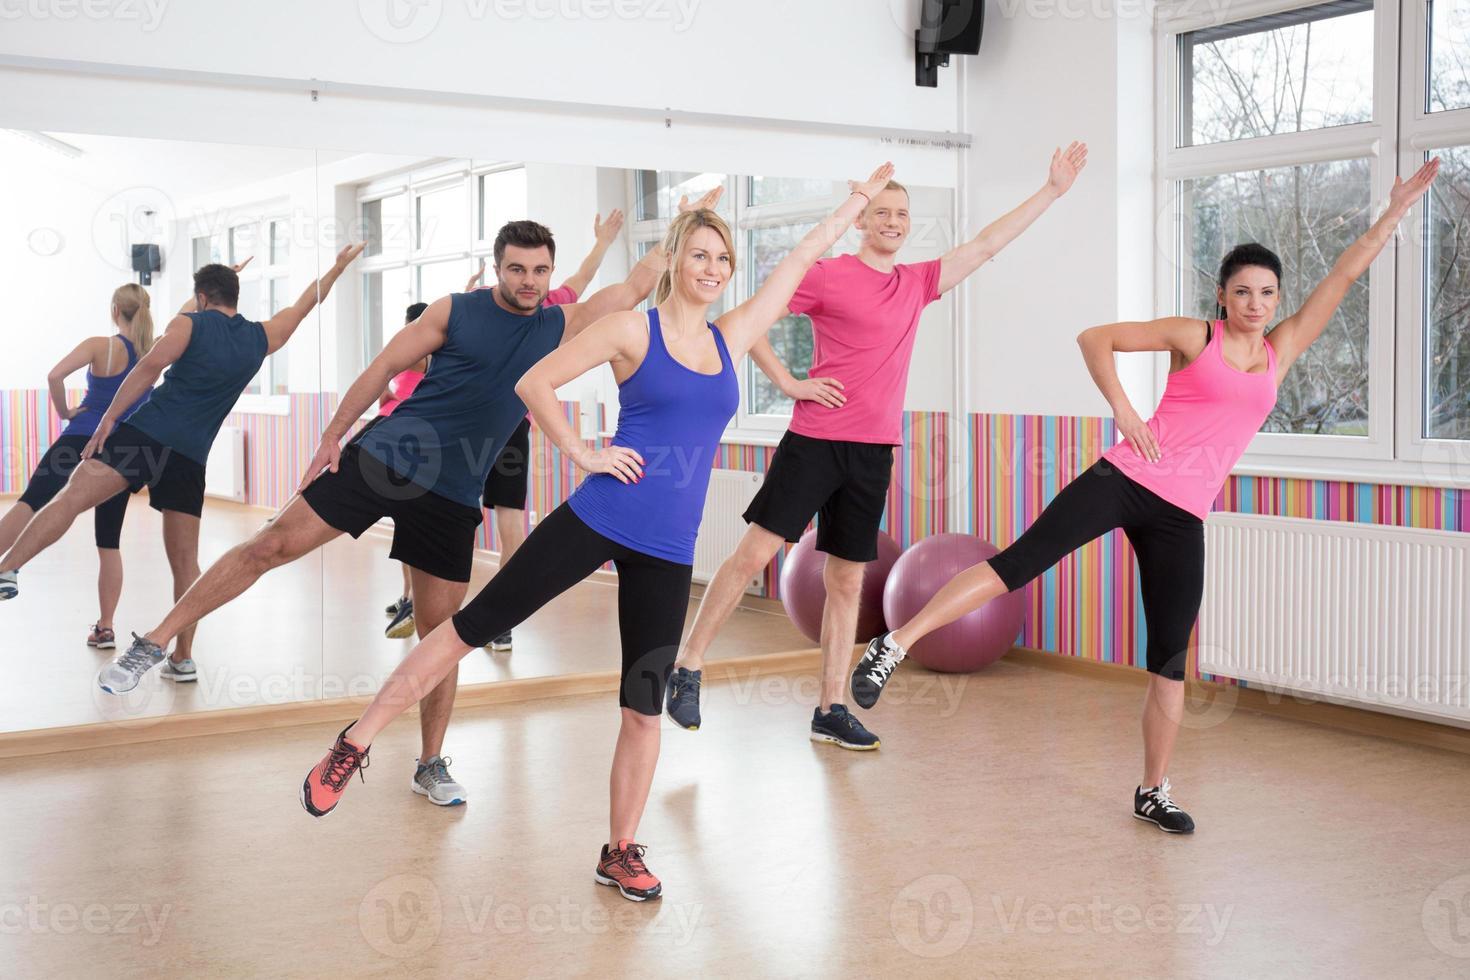 aeróbicos en clases de fitness foto